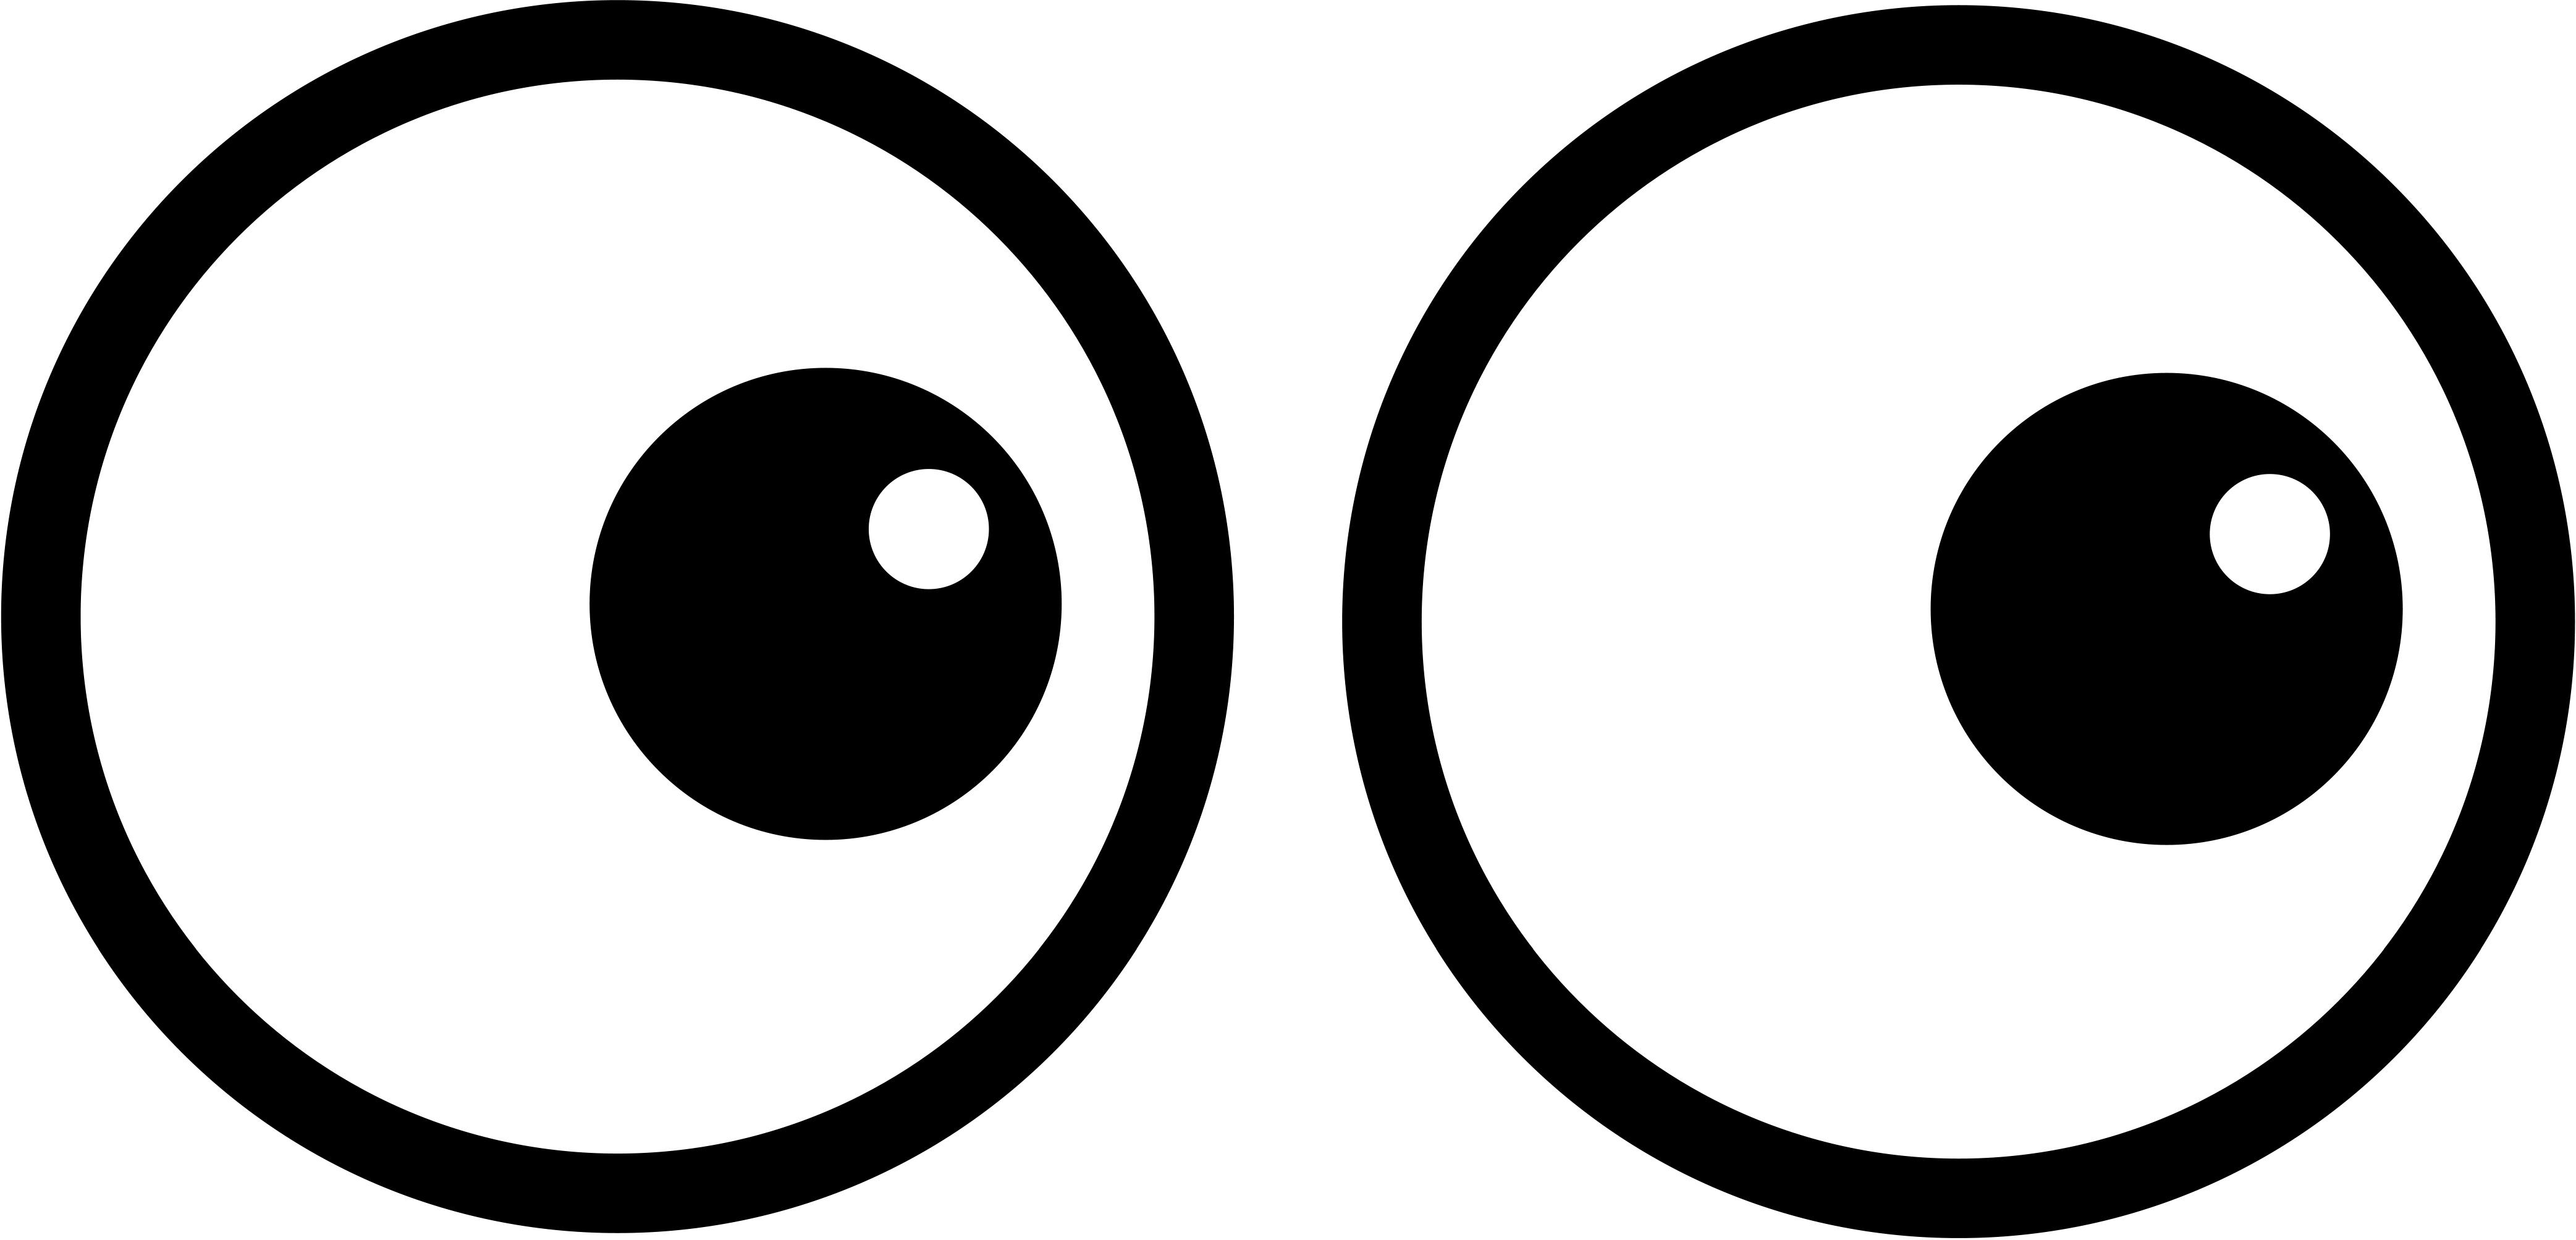 4169x2007 Eyeball Human Eye Clip Art Free Clipart Images Image